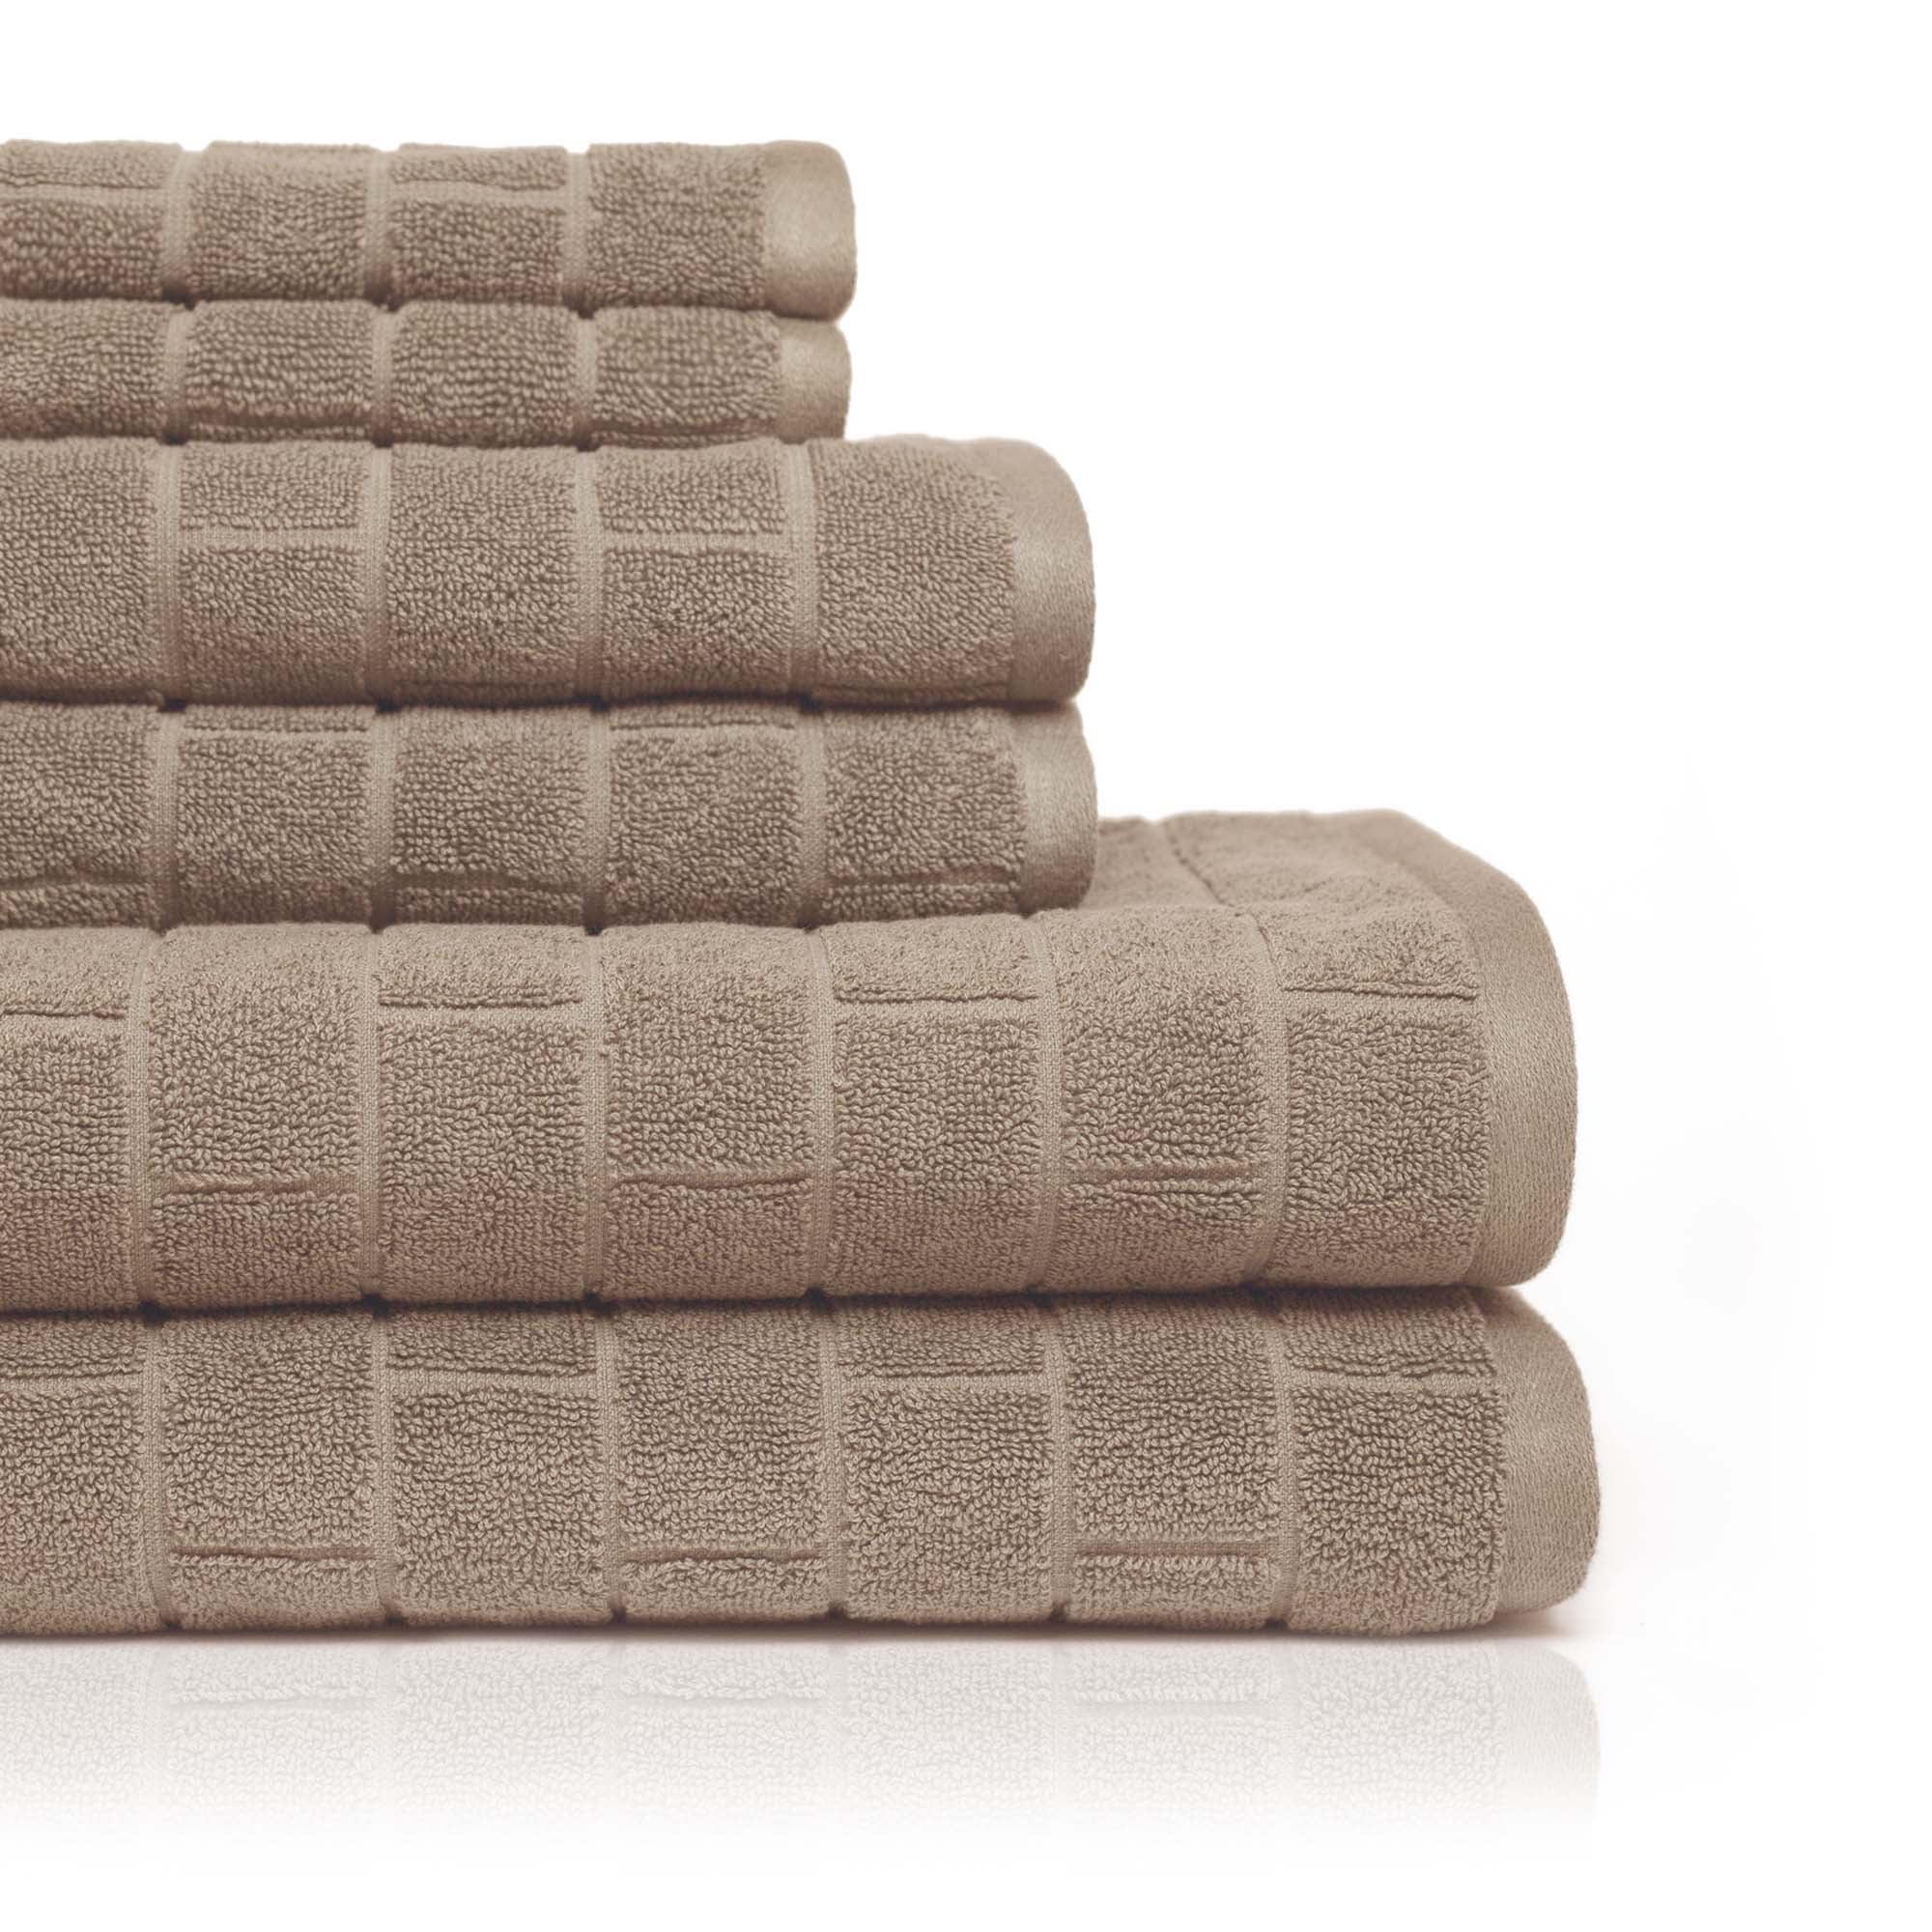 Cobblestone Tiles 6 Piece Towel Set in Barn Red